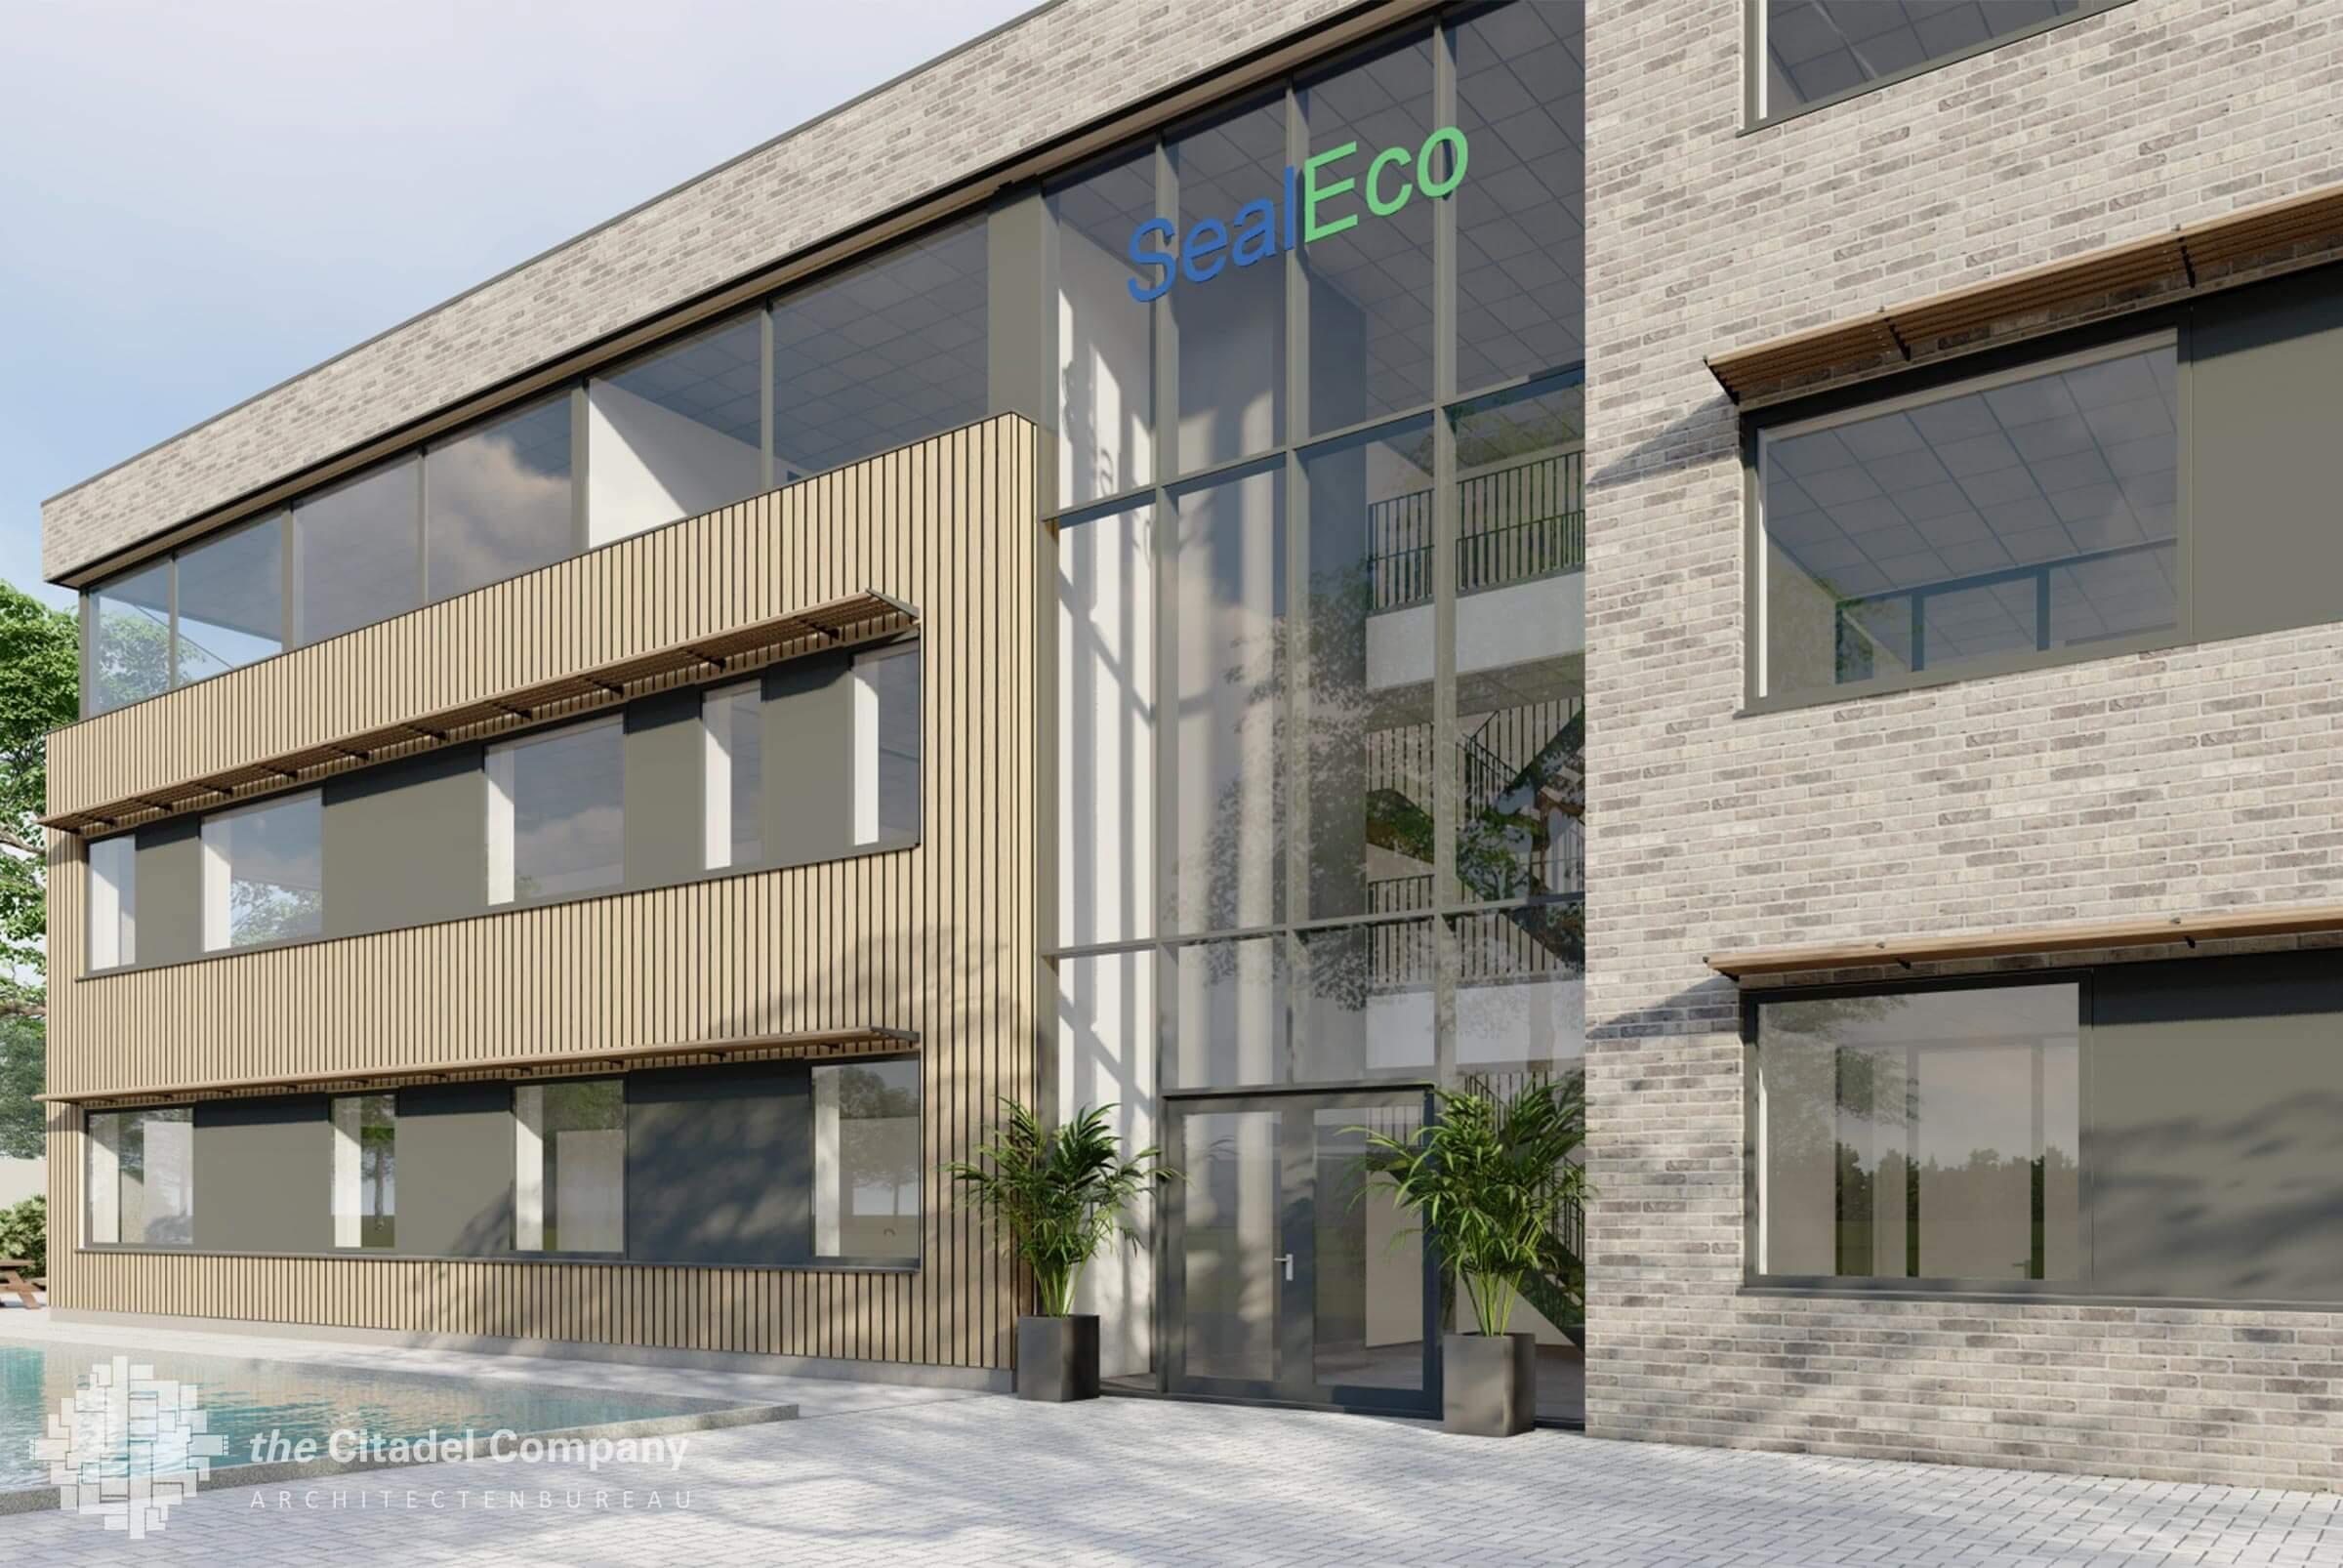 Nieuw bedrijfspand SealEco